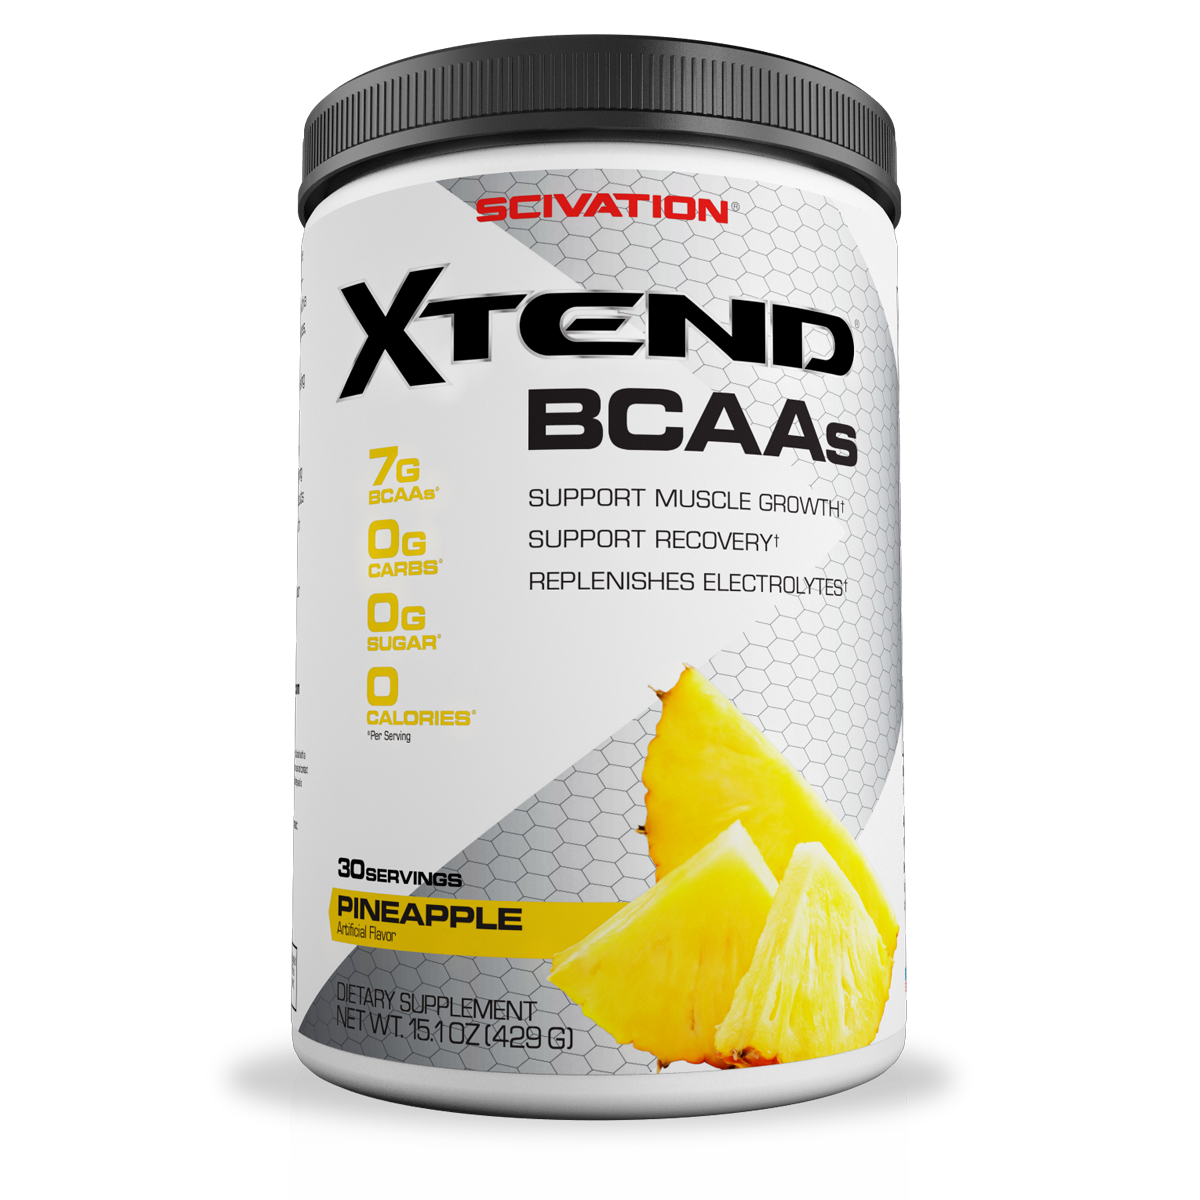 Scivation Xtend BCAA Powder, Pineapple, 30 Servings